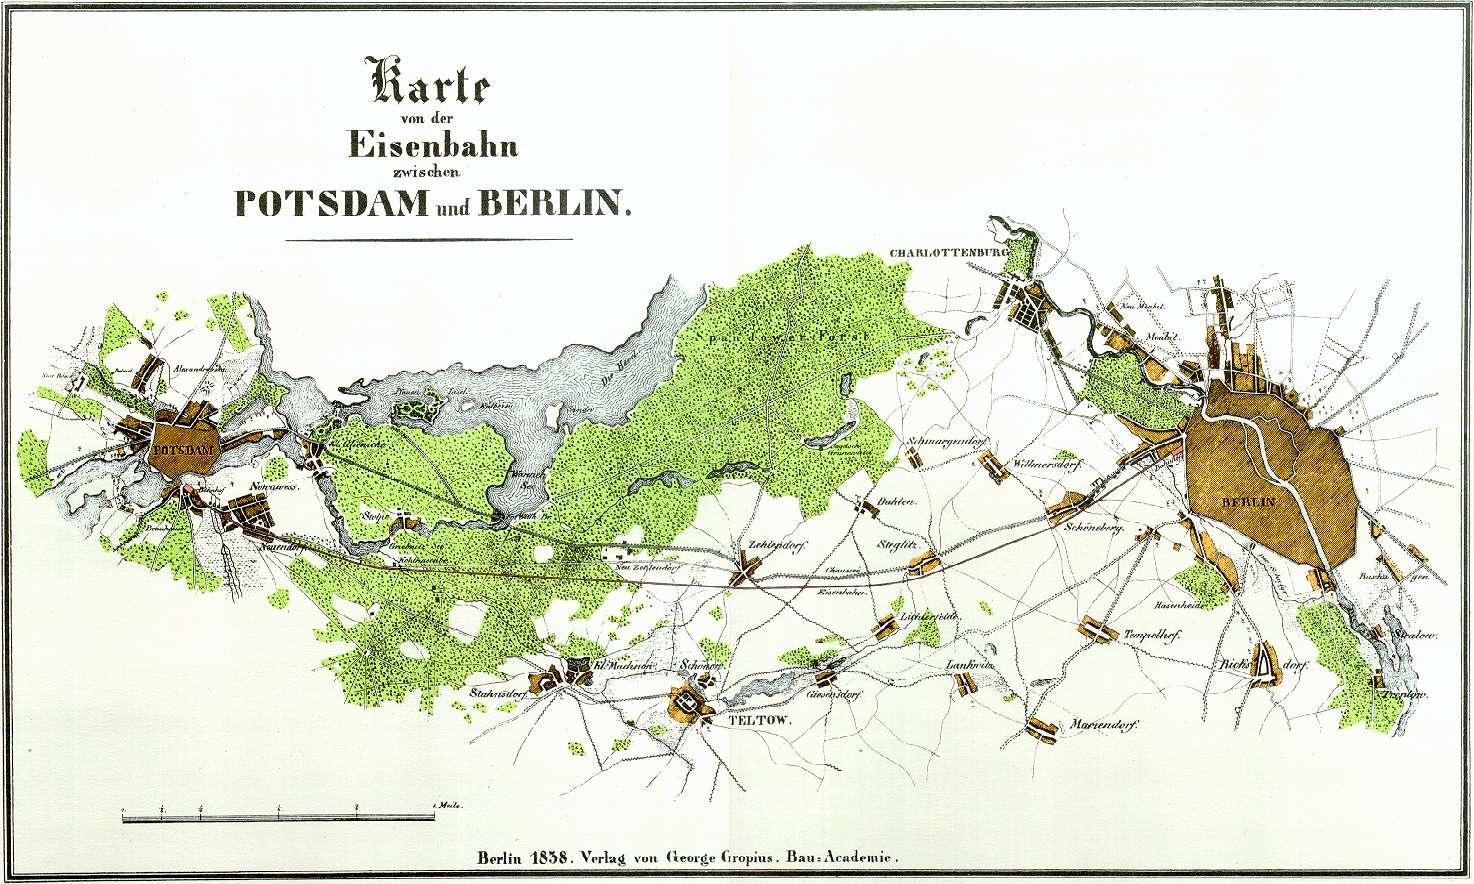 Berlin Potsdam Karte.Berlin Potsdam Magdeburger Eisenbahn